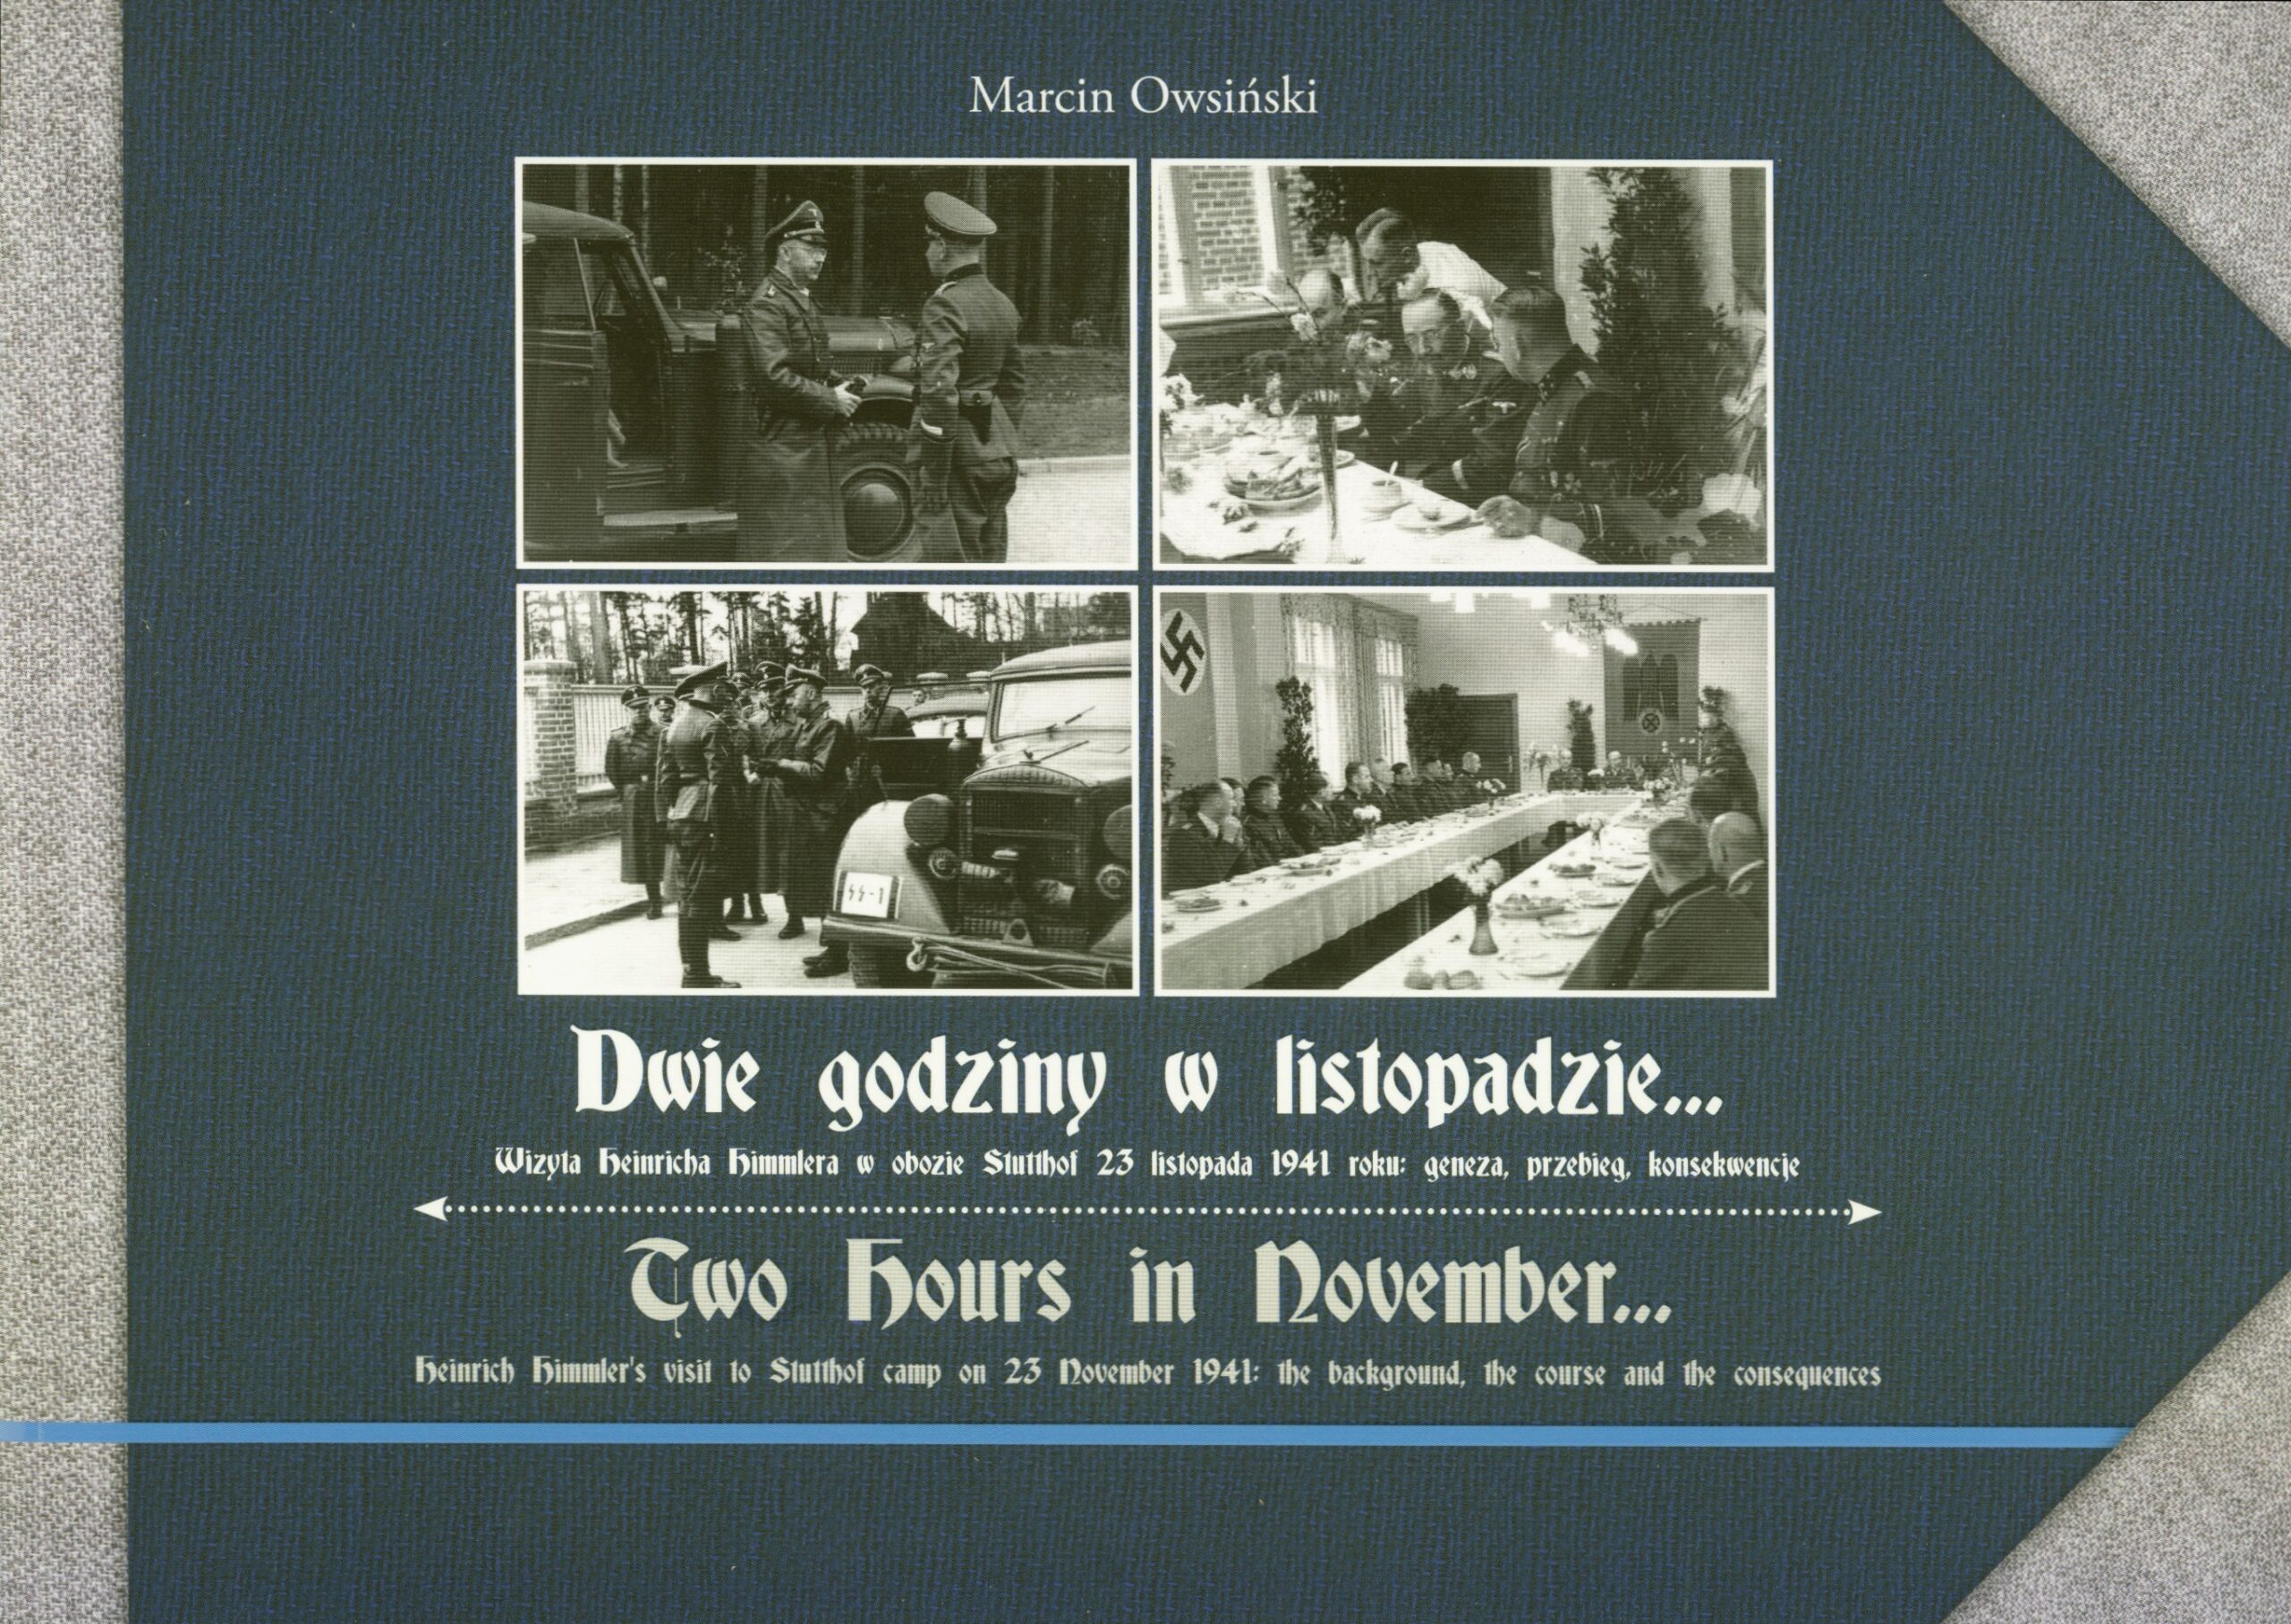 okładka Dwie godziny w listopadzie...  Wizyta Heinricha Himmlera w obozie Stutthof 23 listopada 1941 roku: geneza, przebieg, konsekwencje./ Two Hours in November... Heinrich Himmler's visit to Stutthof camp on 23 November 1941: the background, the course and the consequences.